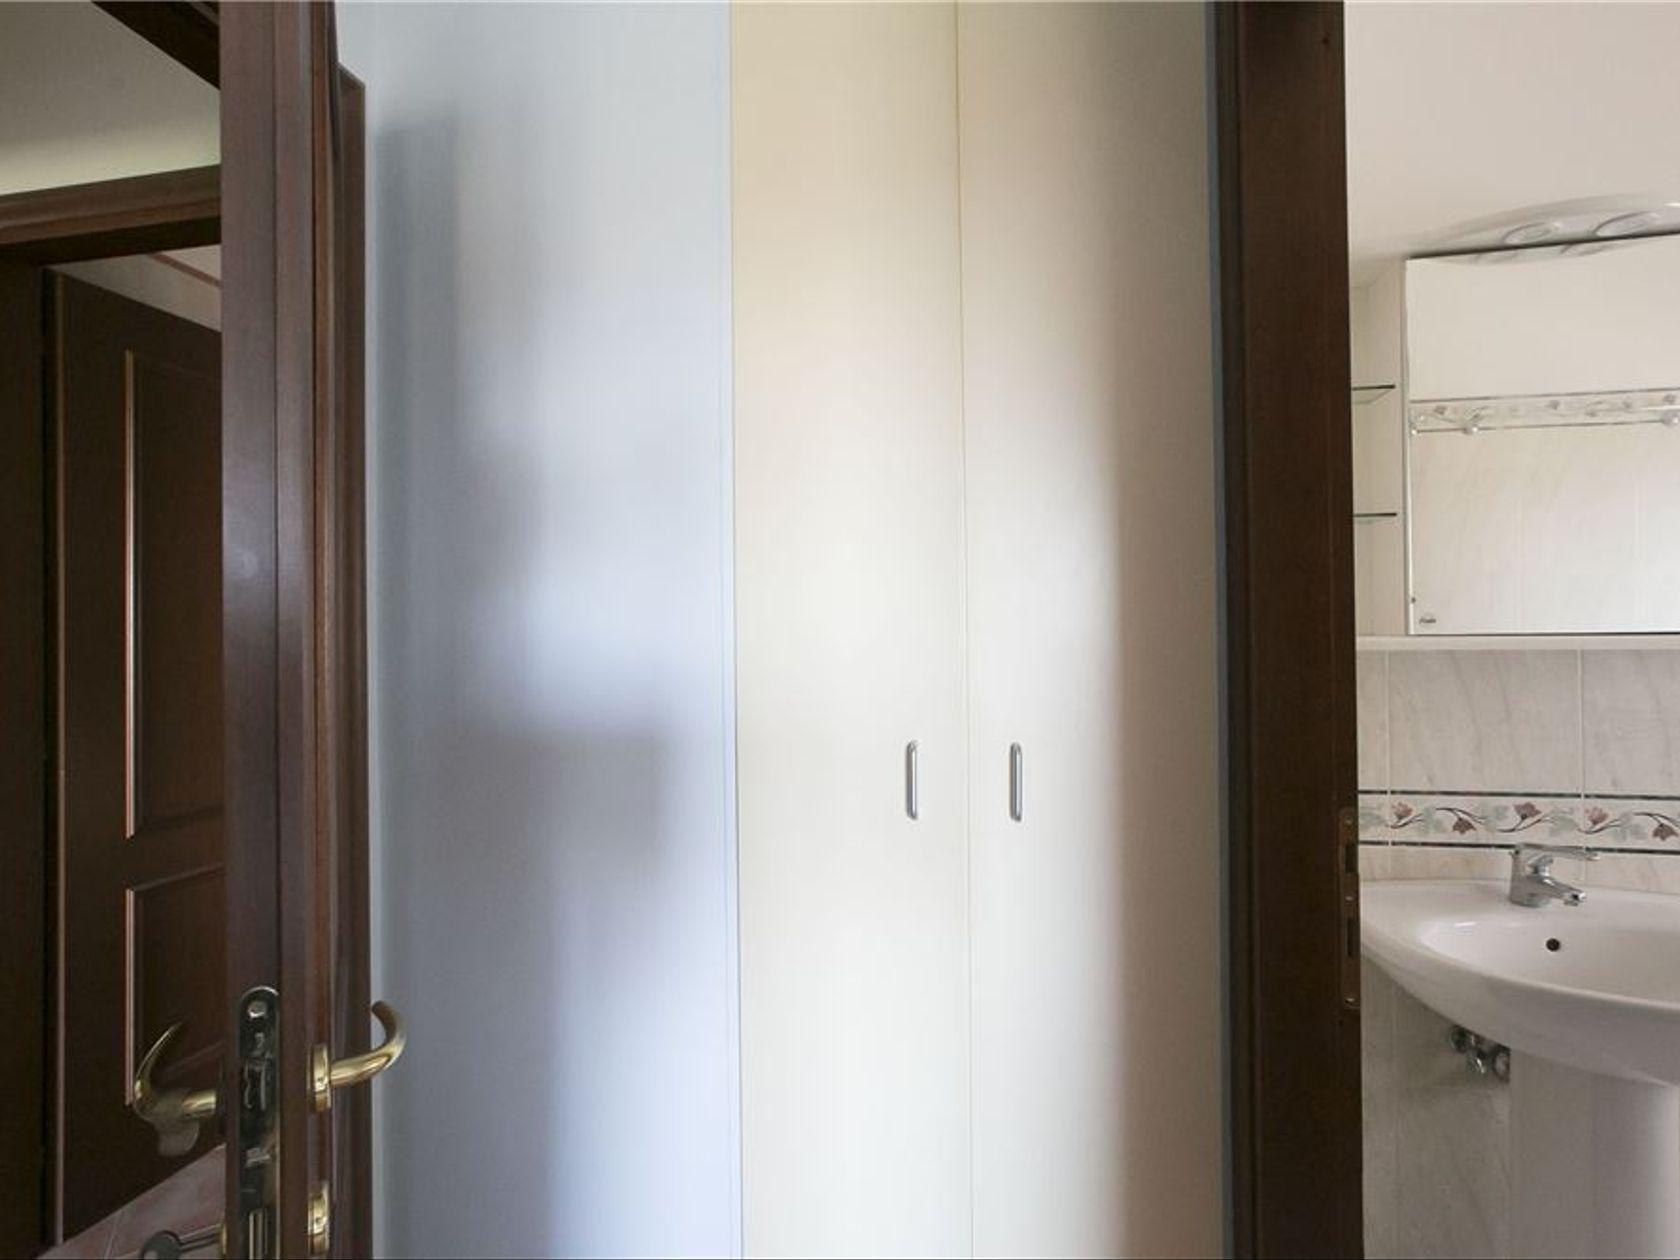 Appartamento Roma-acilia Vitinia Infernetto Axa Casal Palocco, Roma, RM Vendita - Foto 11